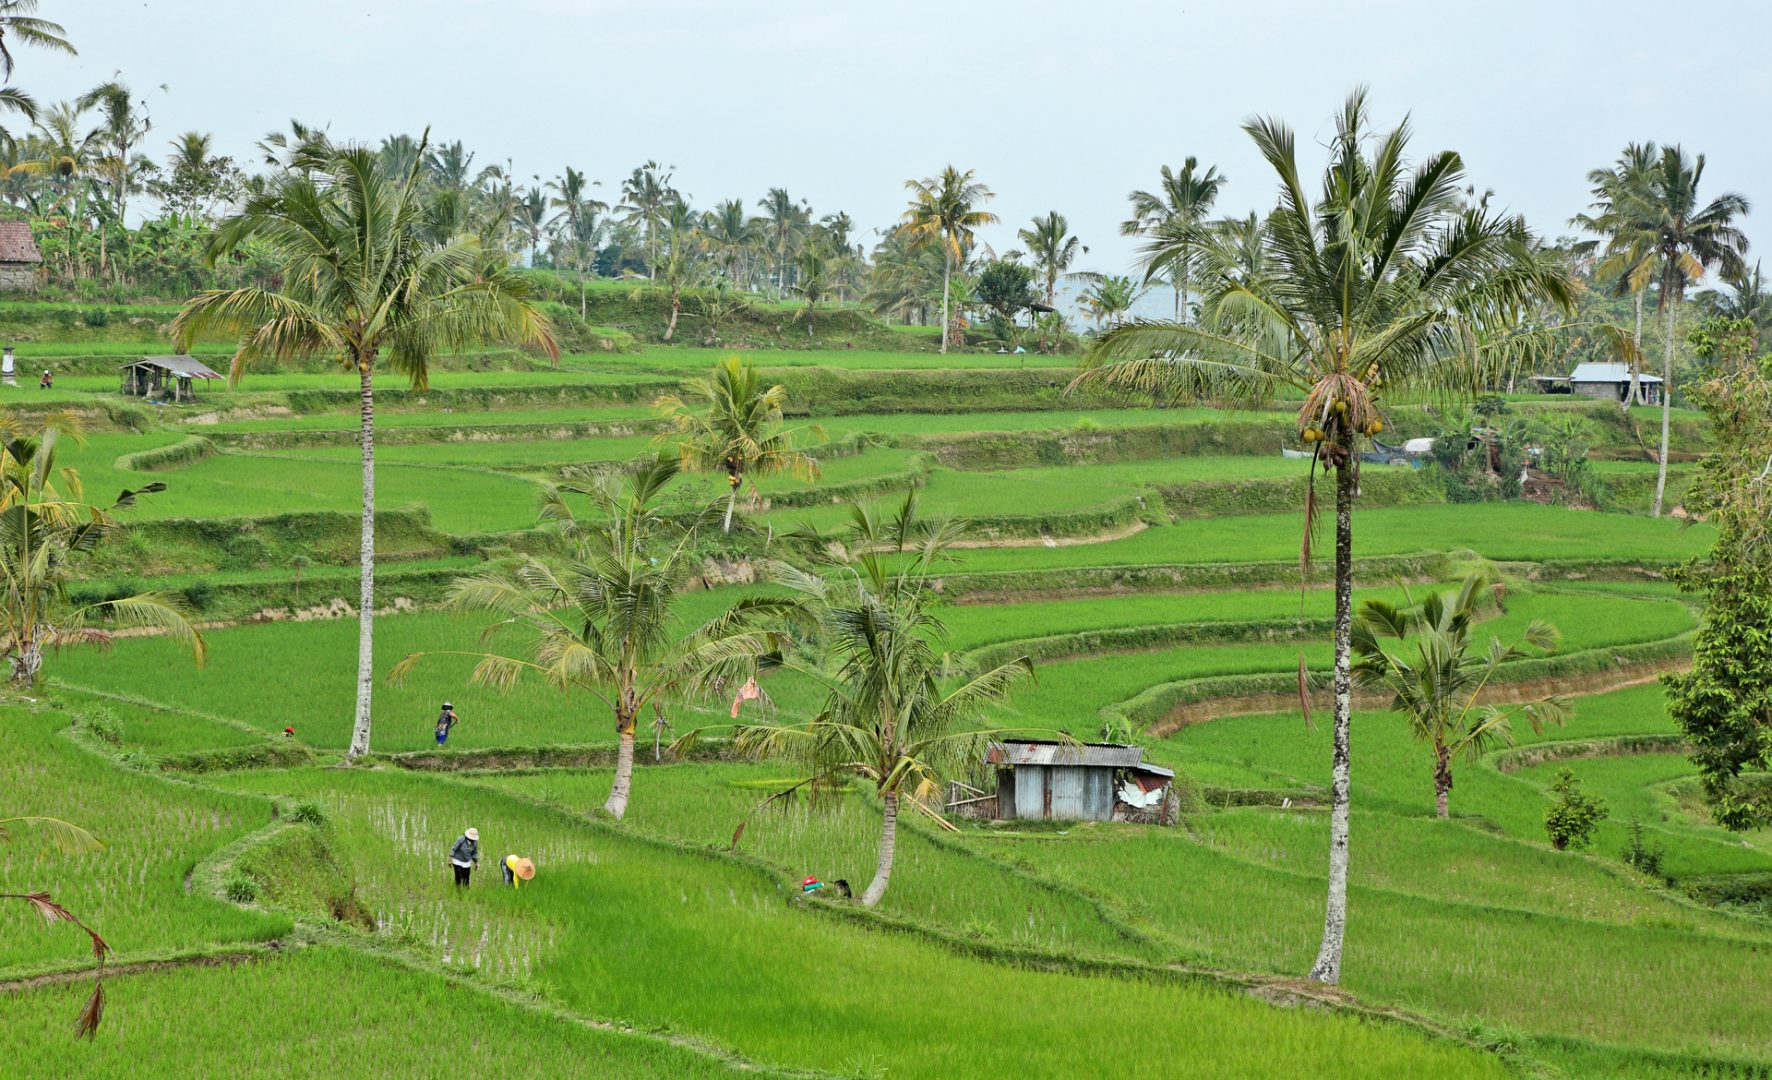 Bali_rizieres_en_etages